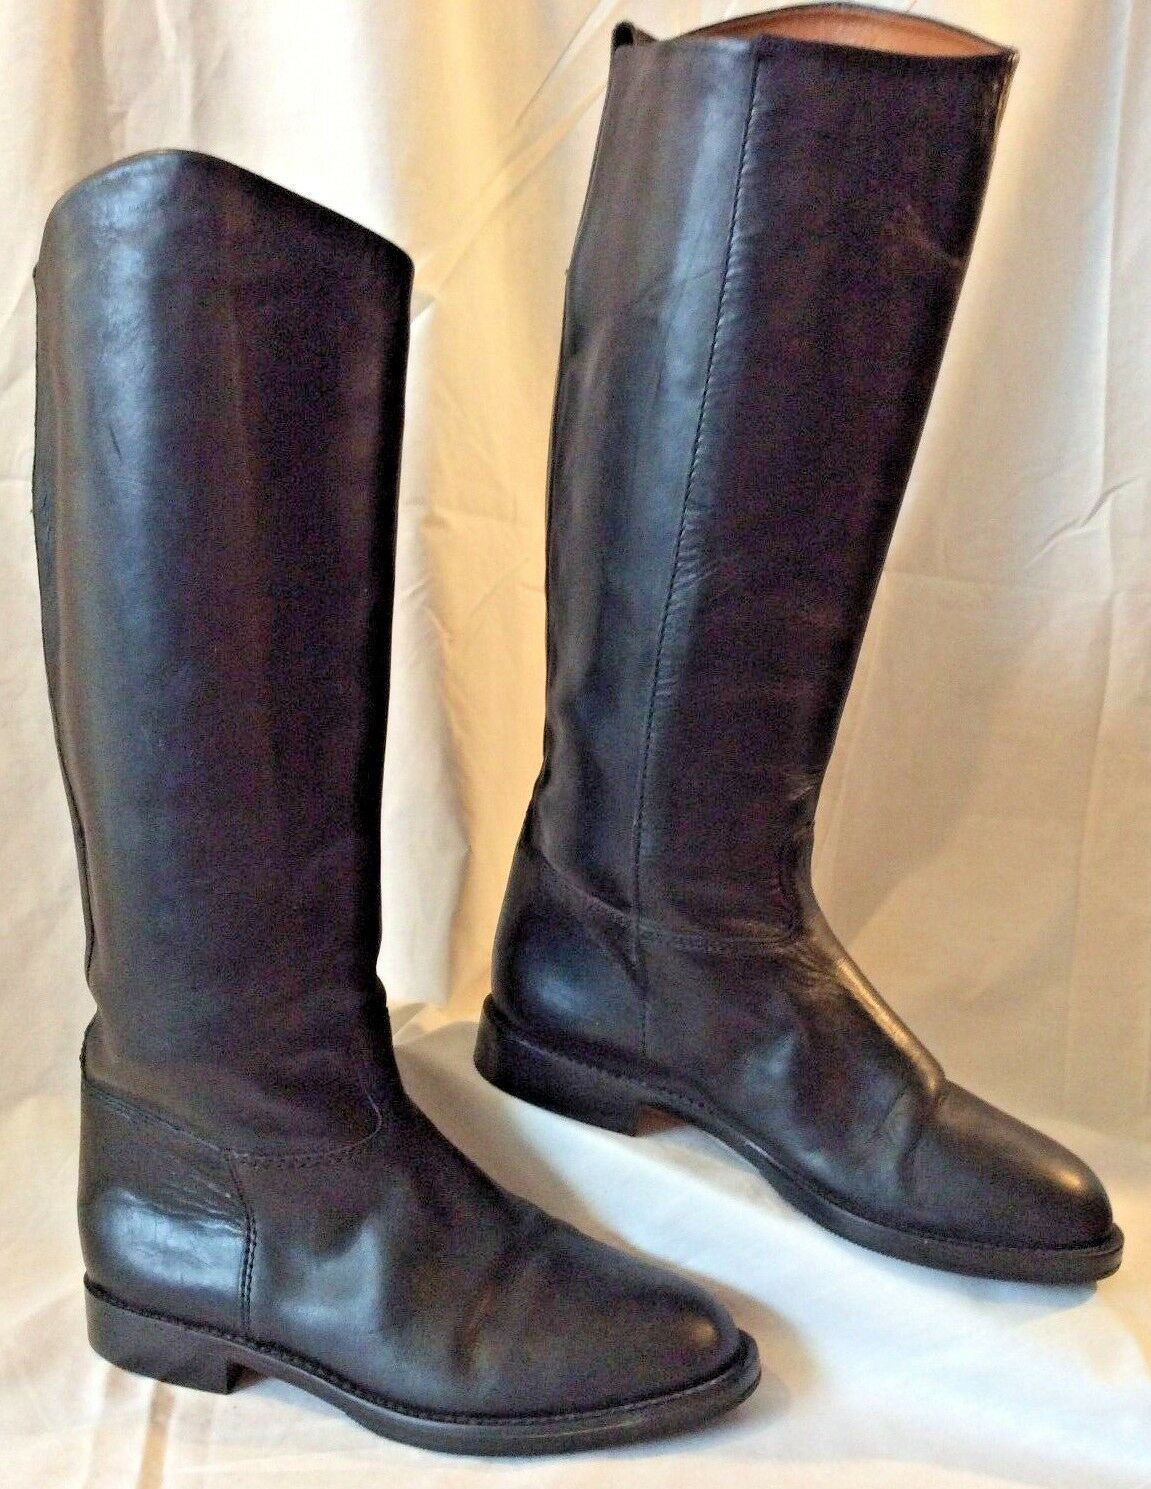 Waverly 5W Negro Cuero Inglés Ecuestre botas de montar a  caballo de campo VGUC 15-1 2  De Alto  productos creativos